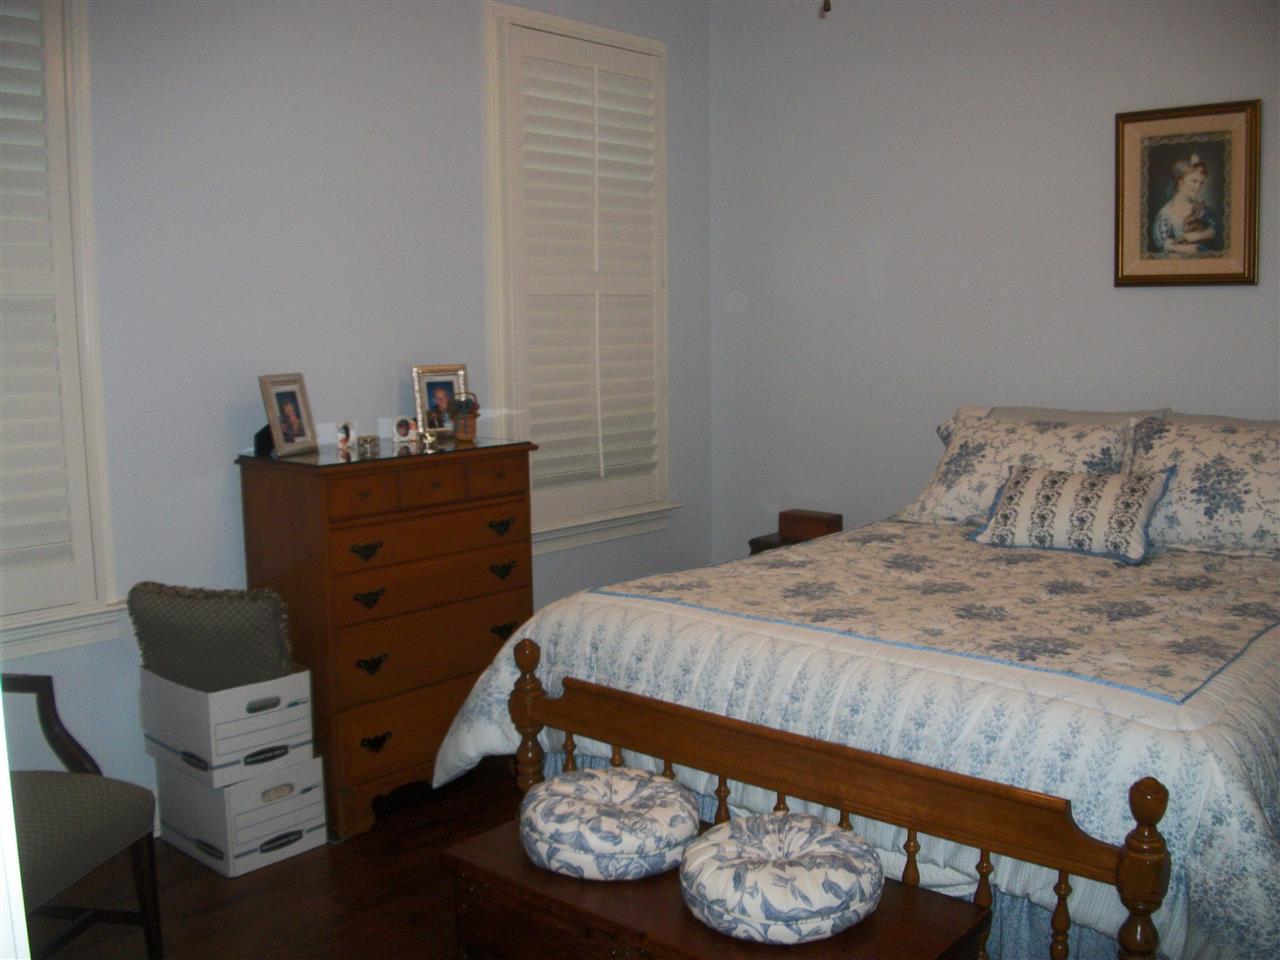 351 S Shea, Collierville, TN 38017